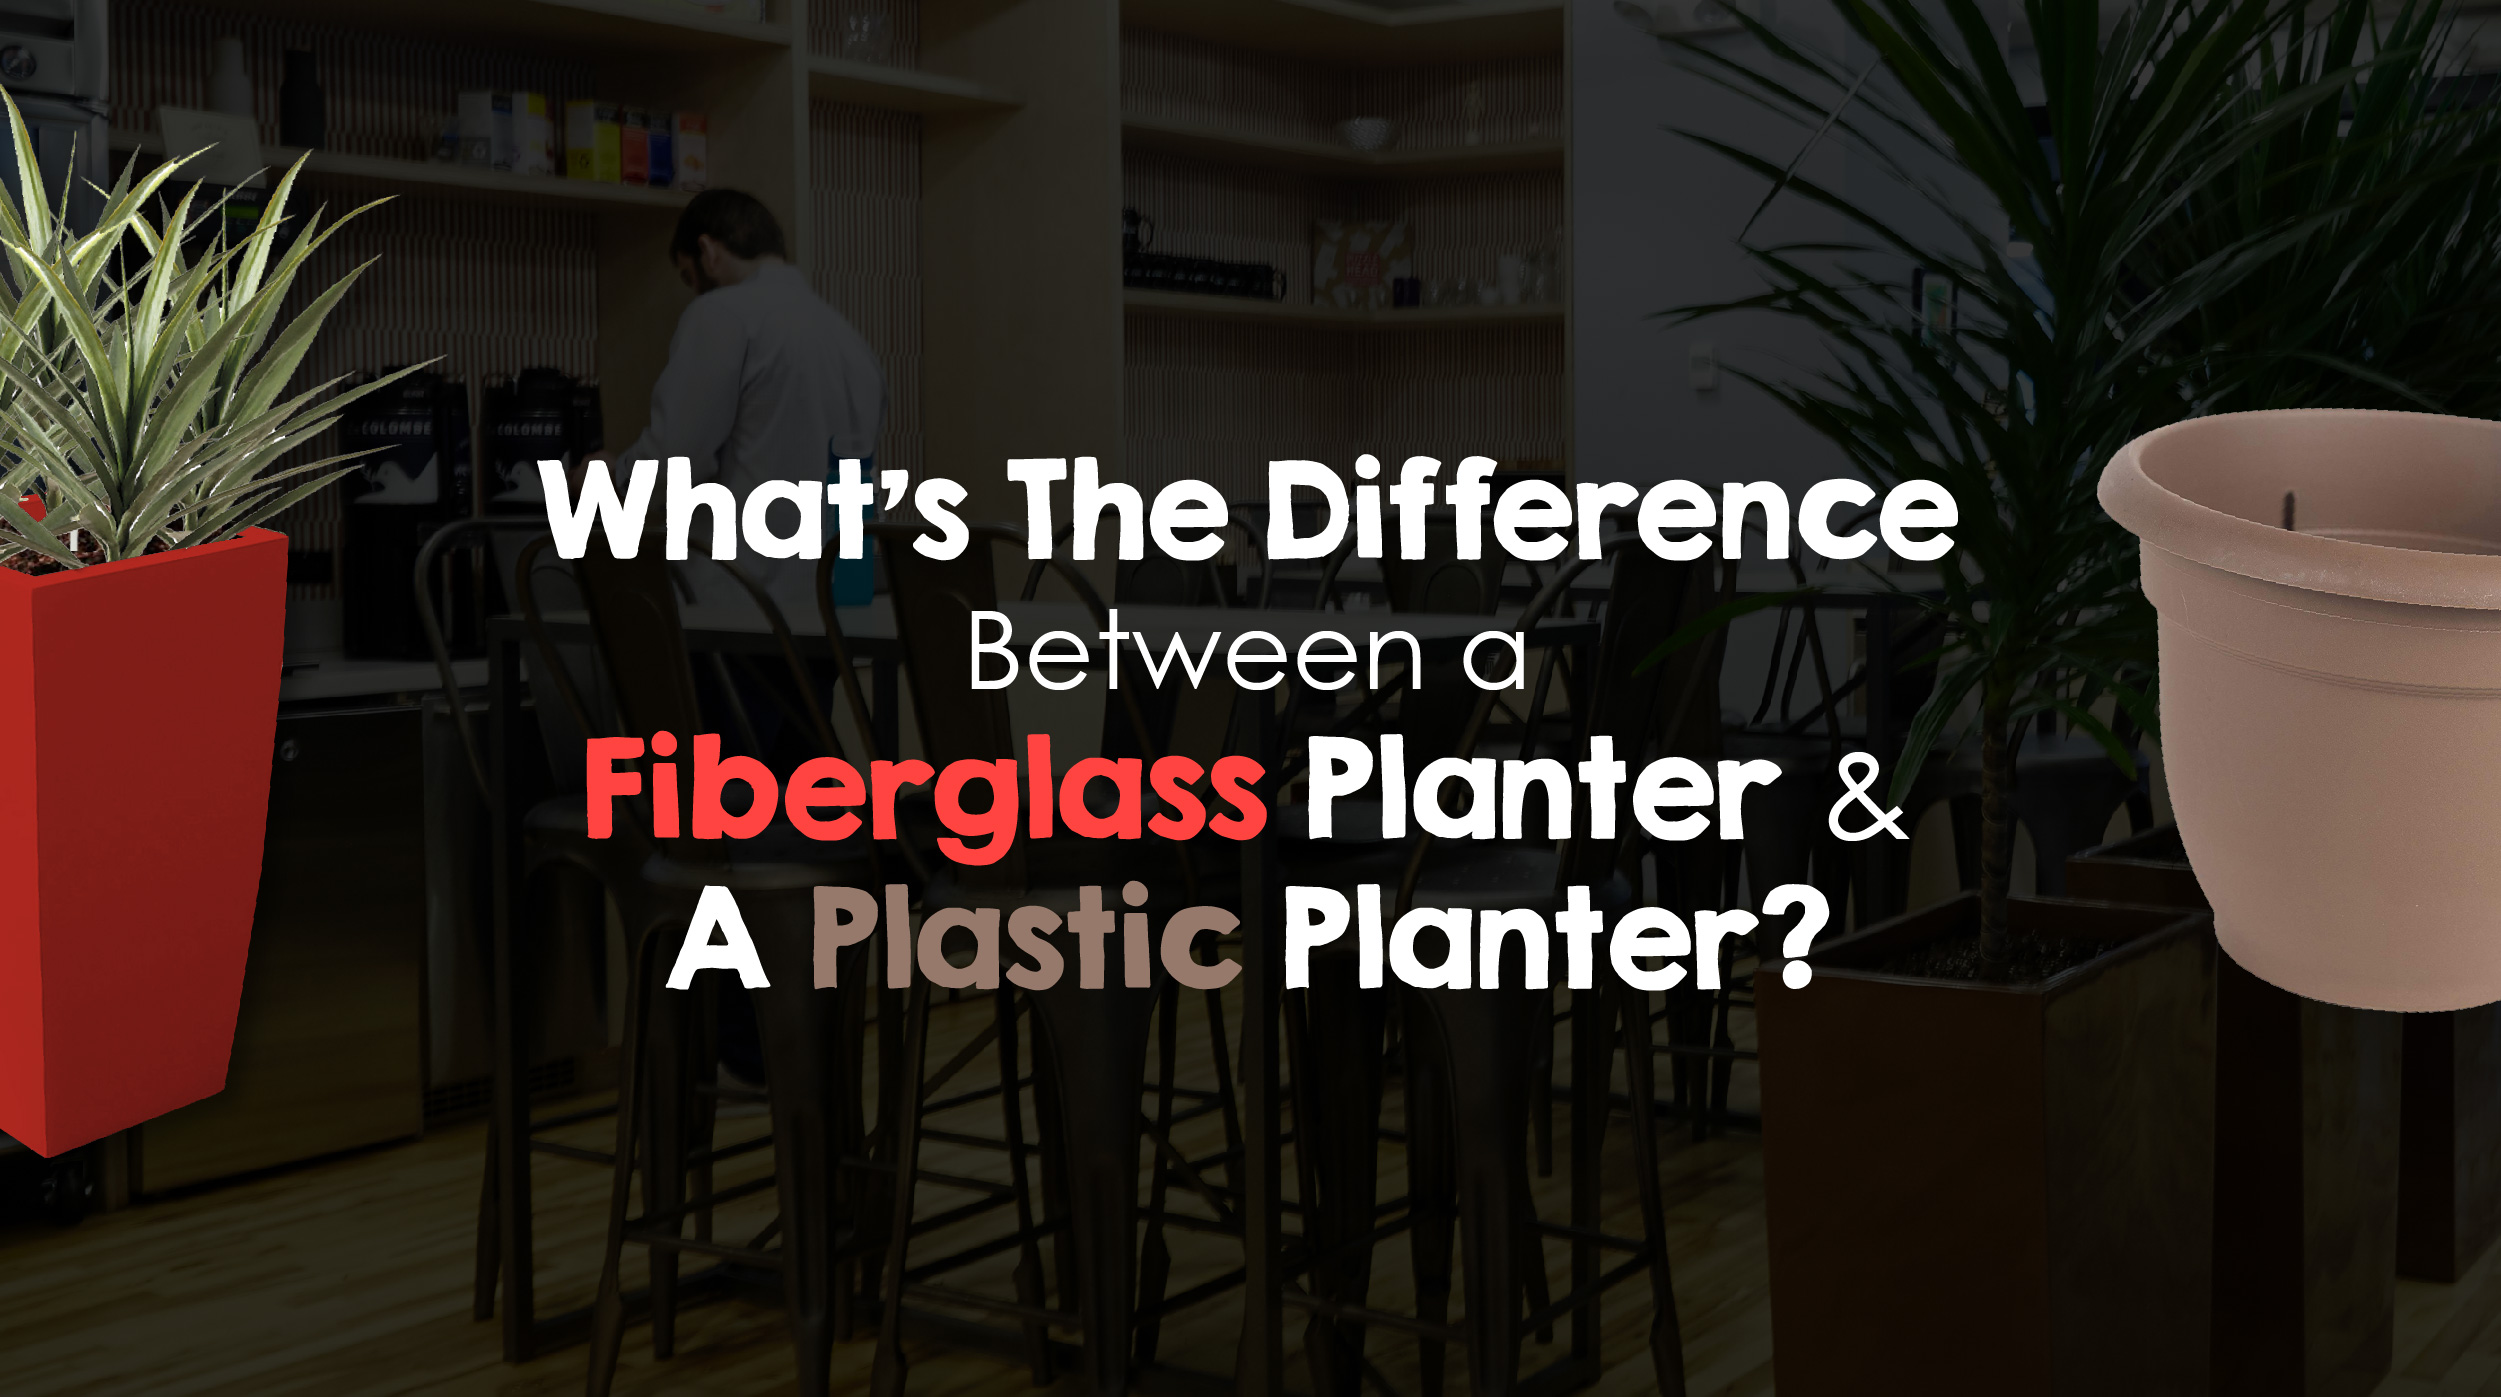 Fiberglass Planters Vs. Plastic Planters